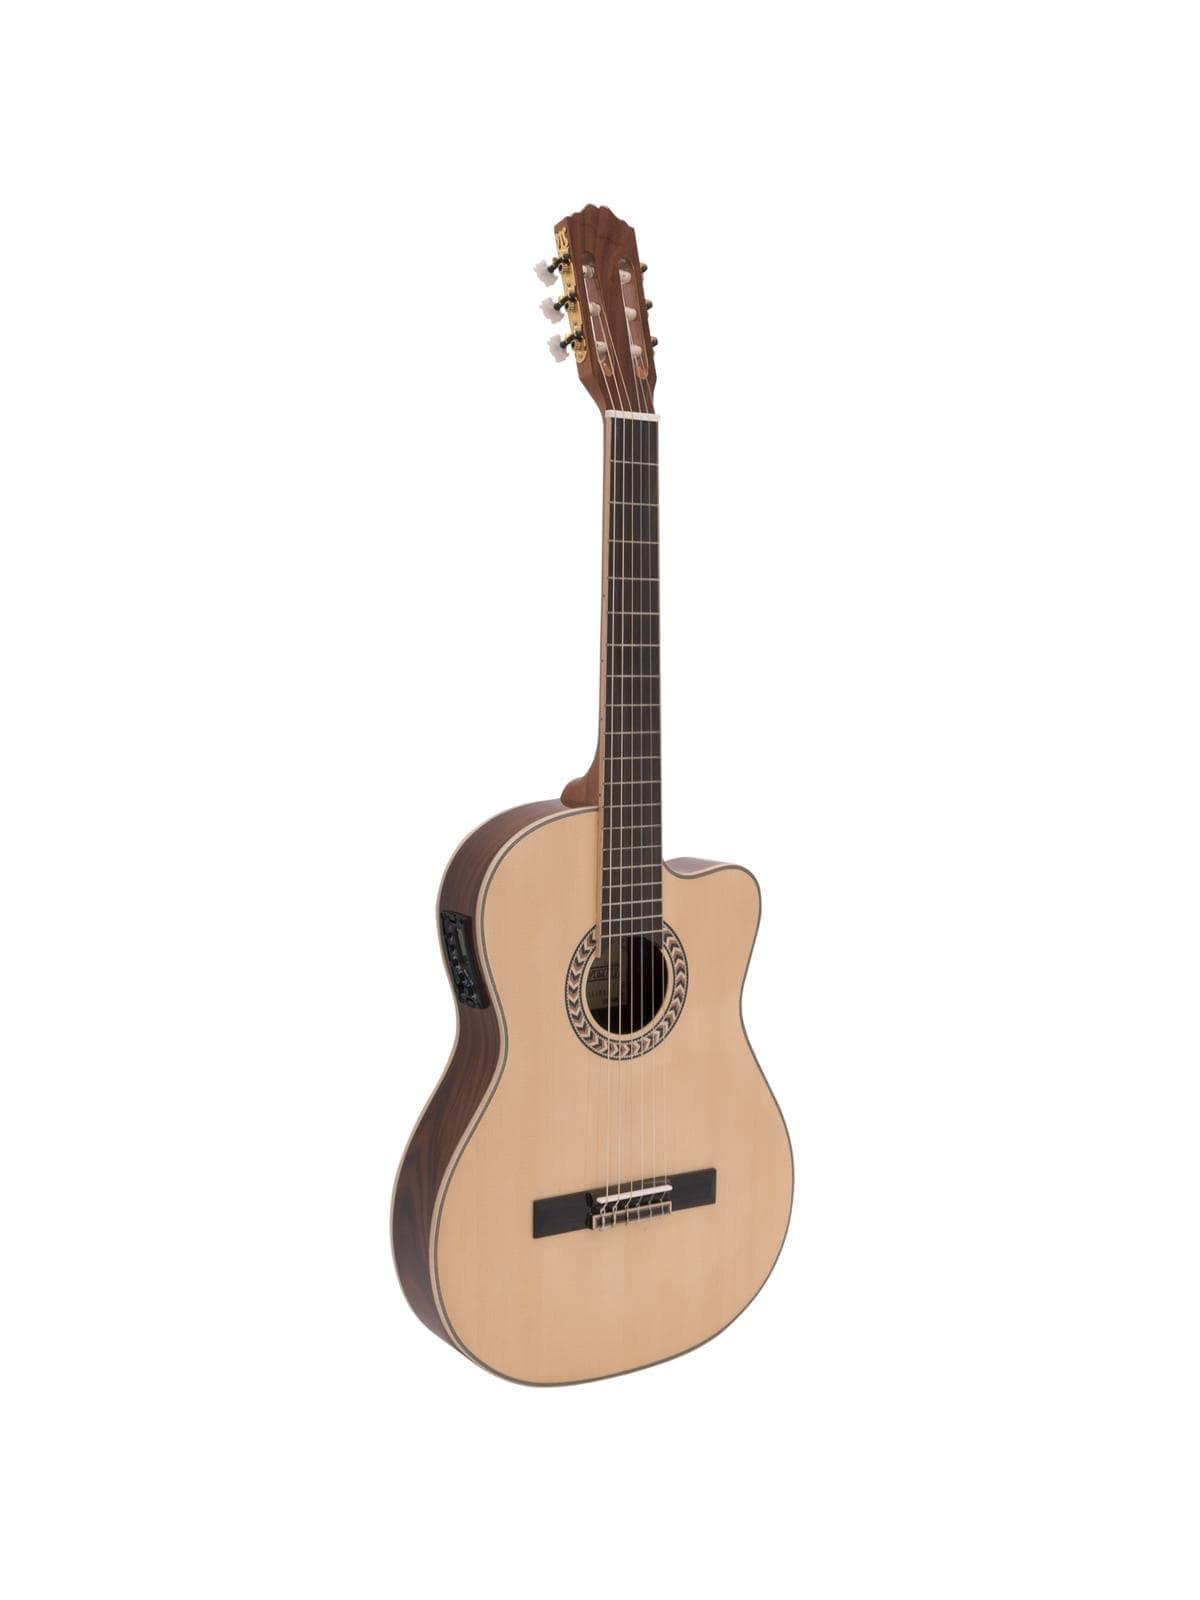 DIMAVERY TB-100 Classical guitar, nature